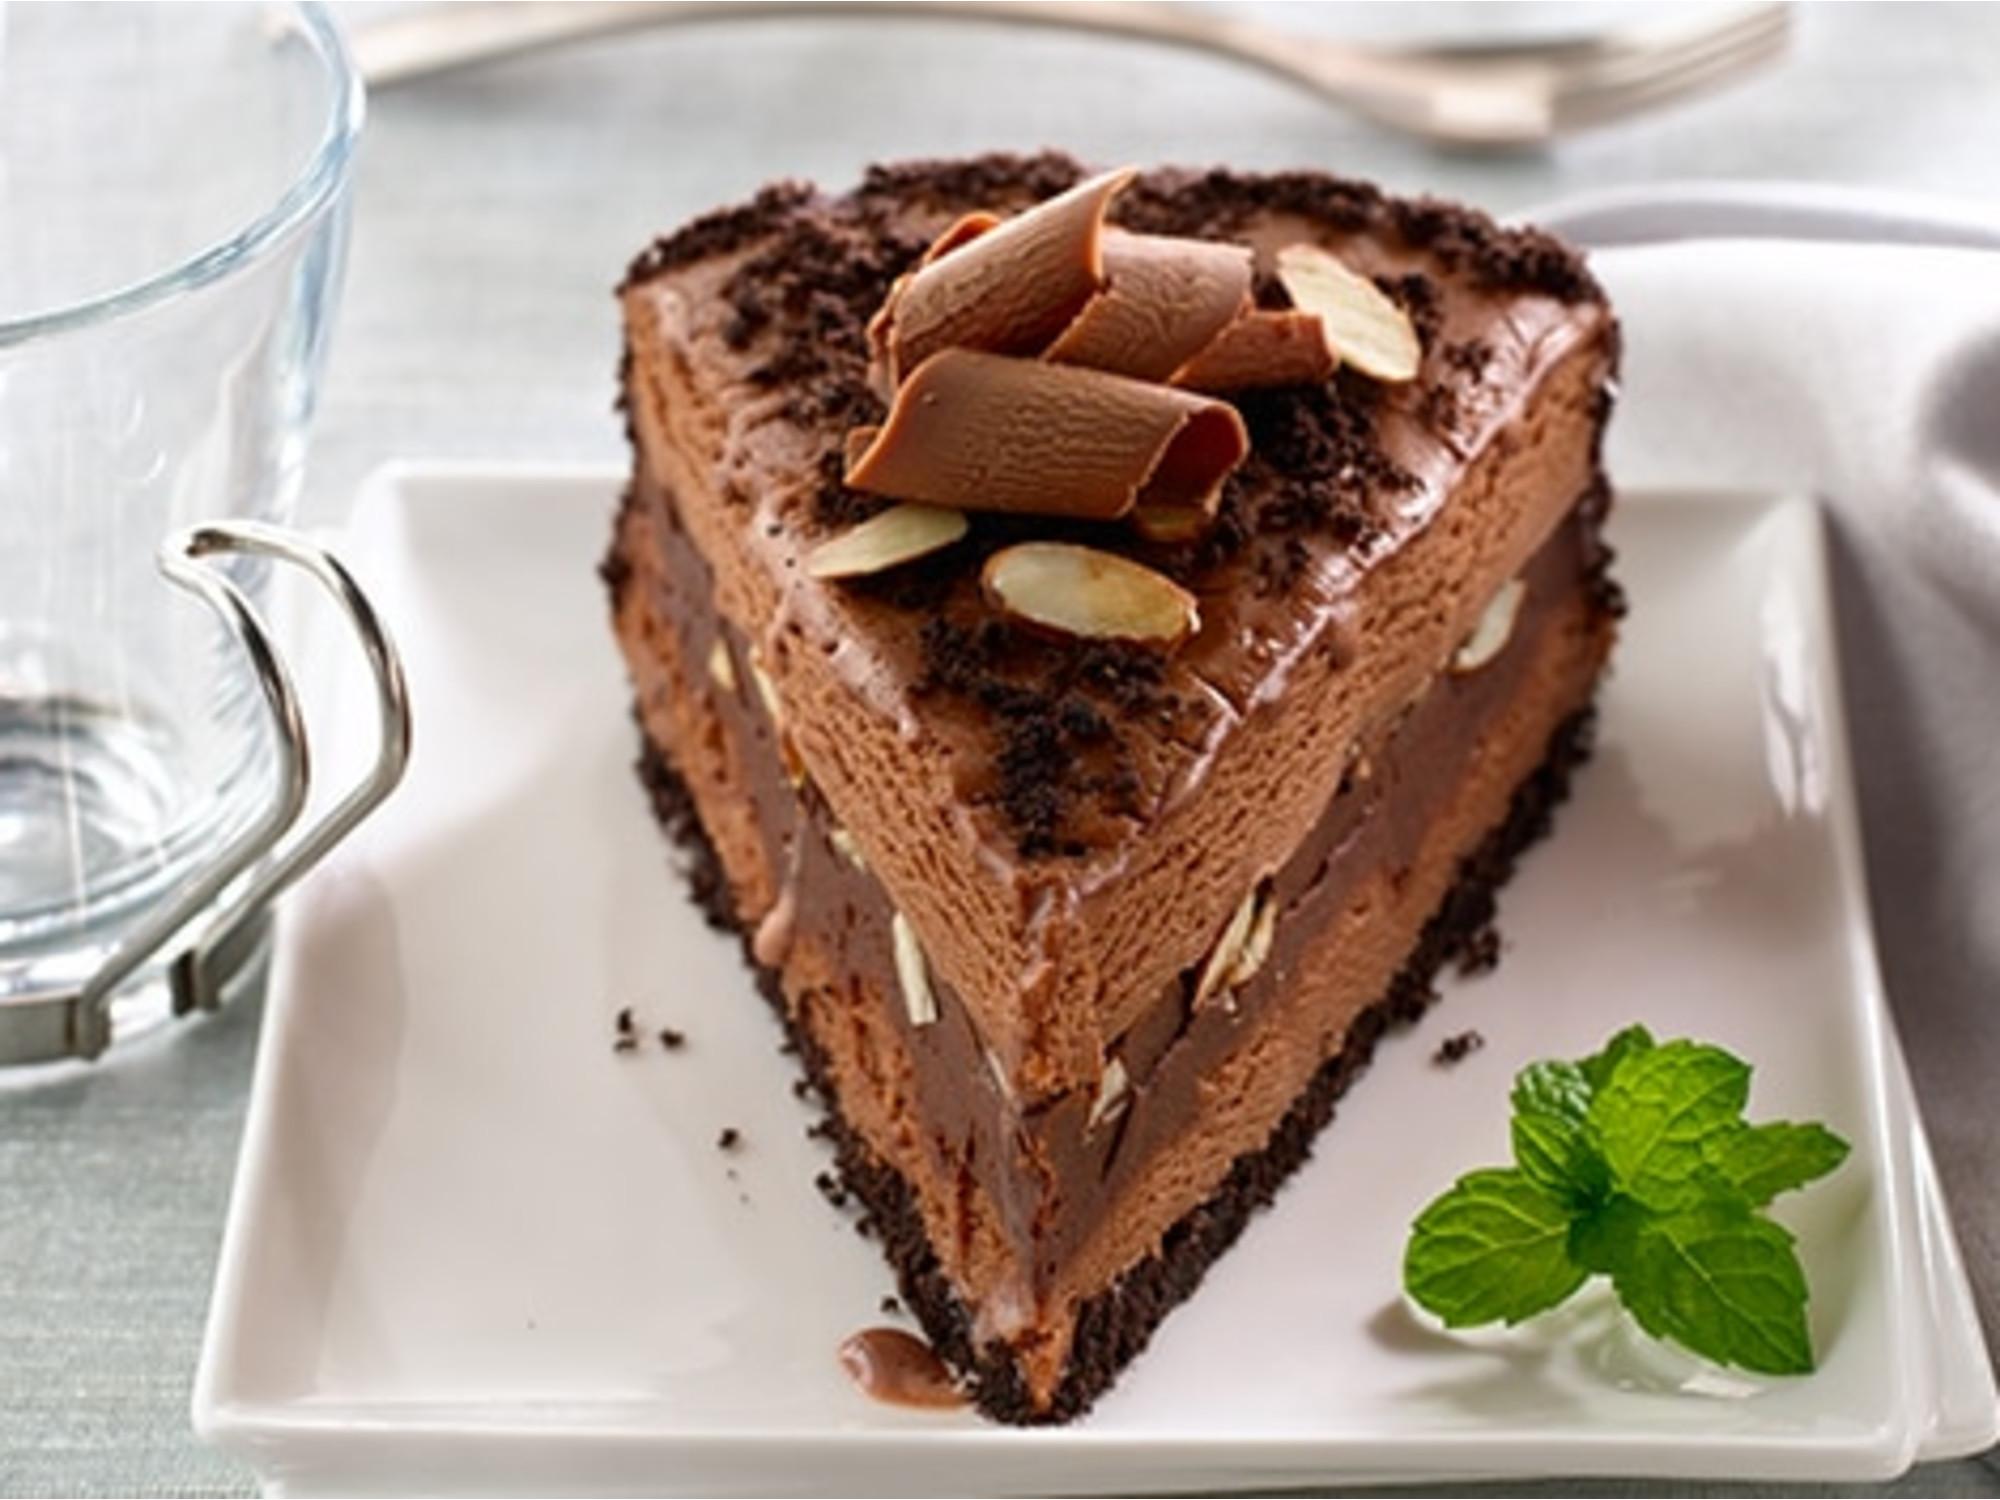 Mocha Almond Fudge Ice Cream Torte